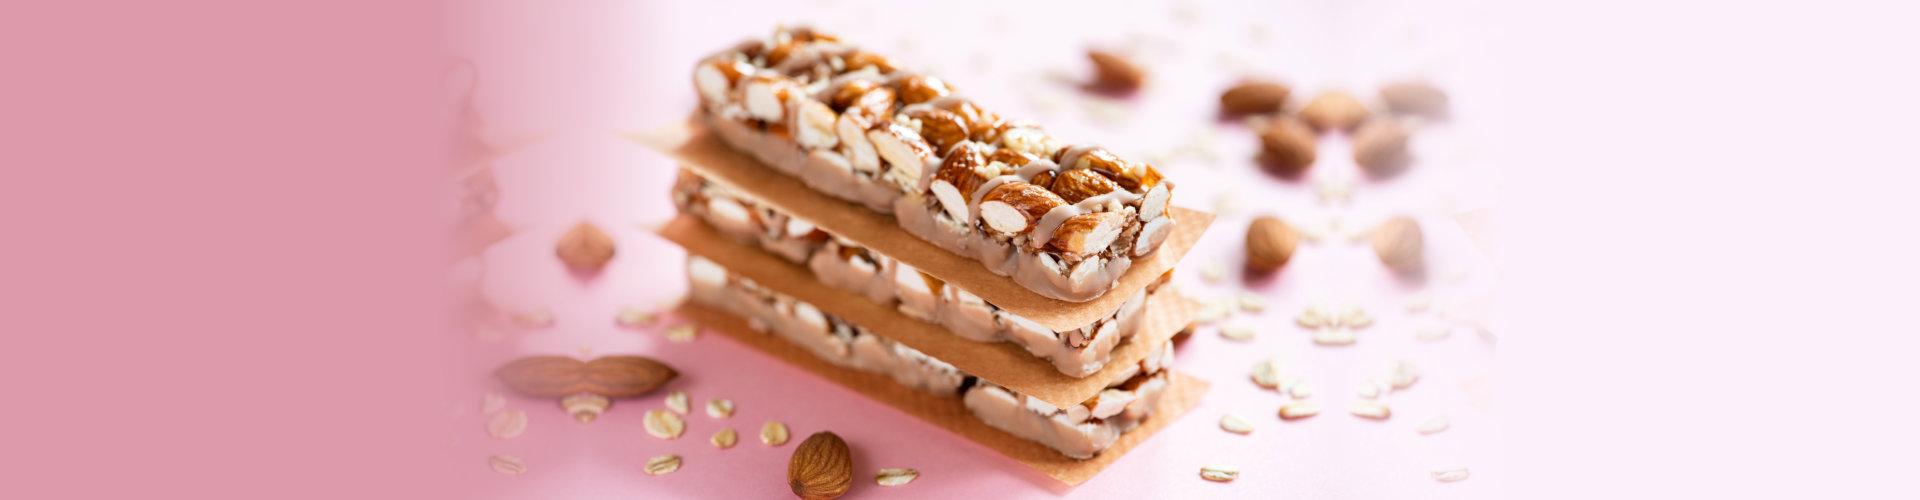 Almond protein bars